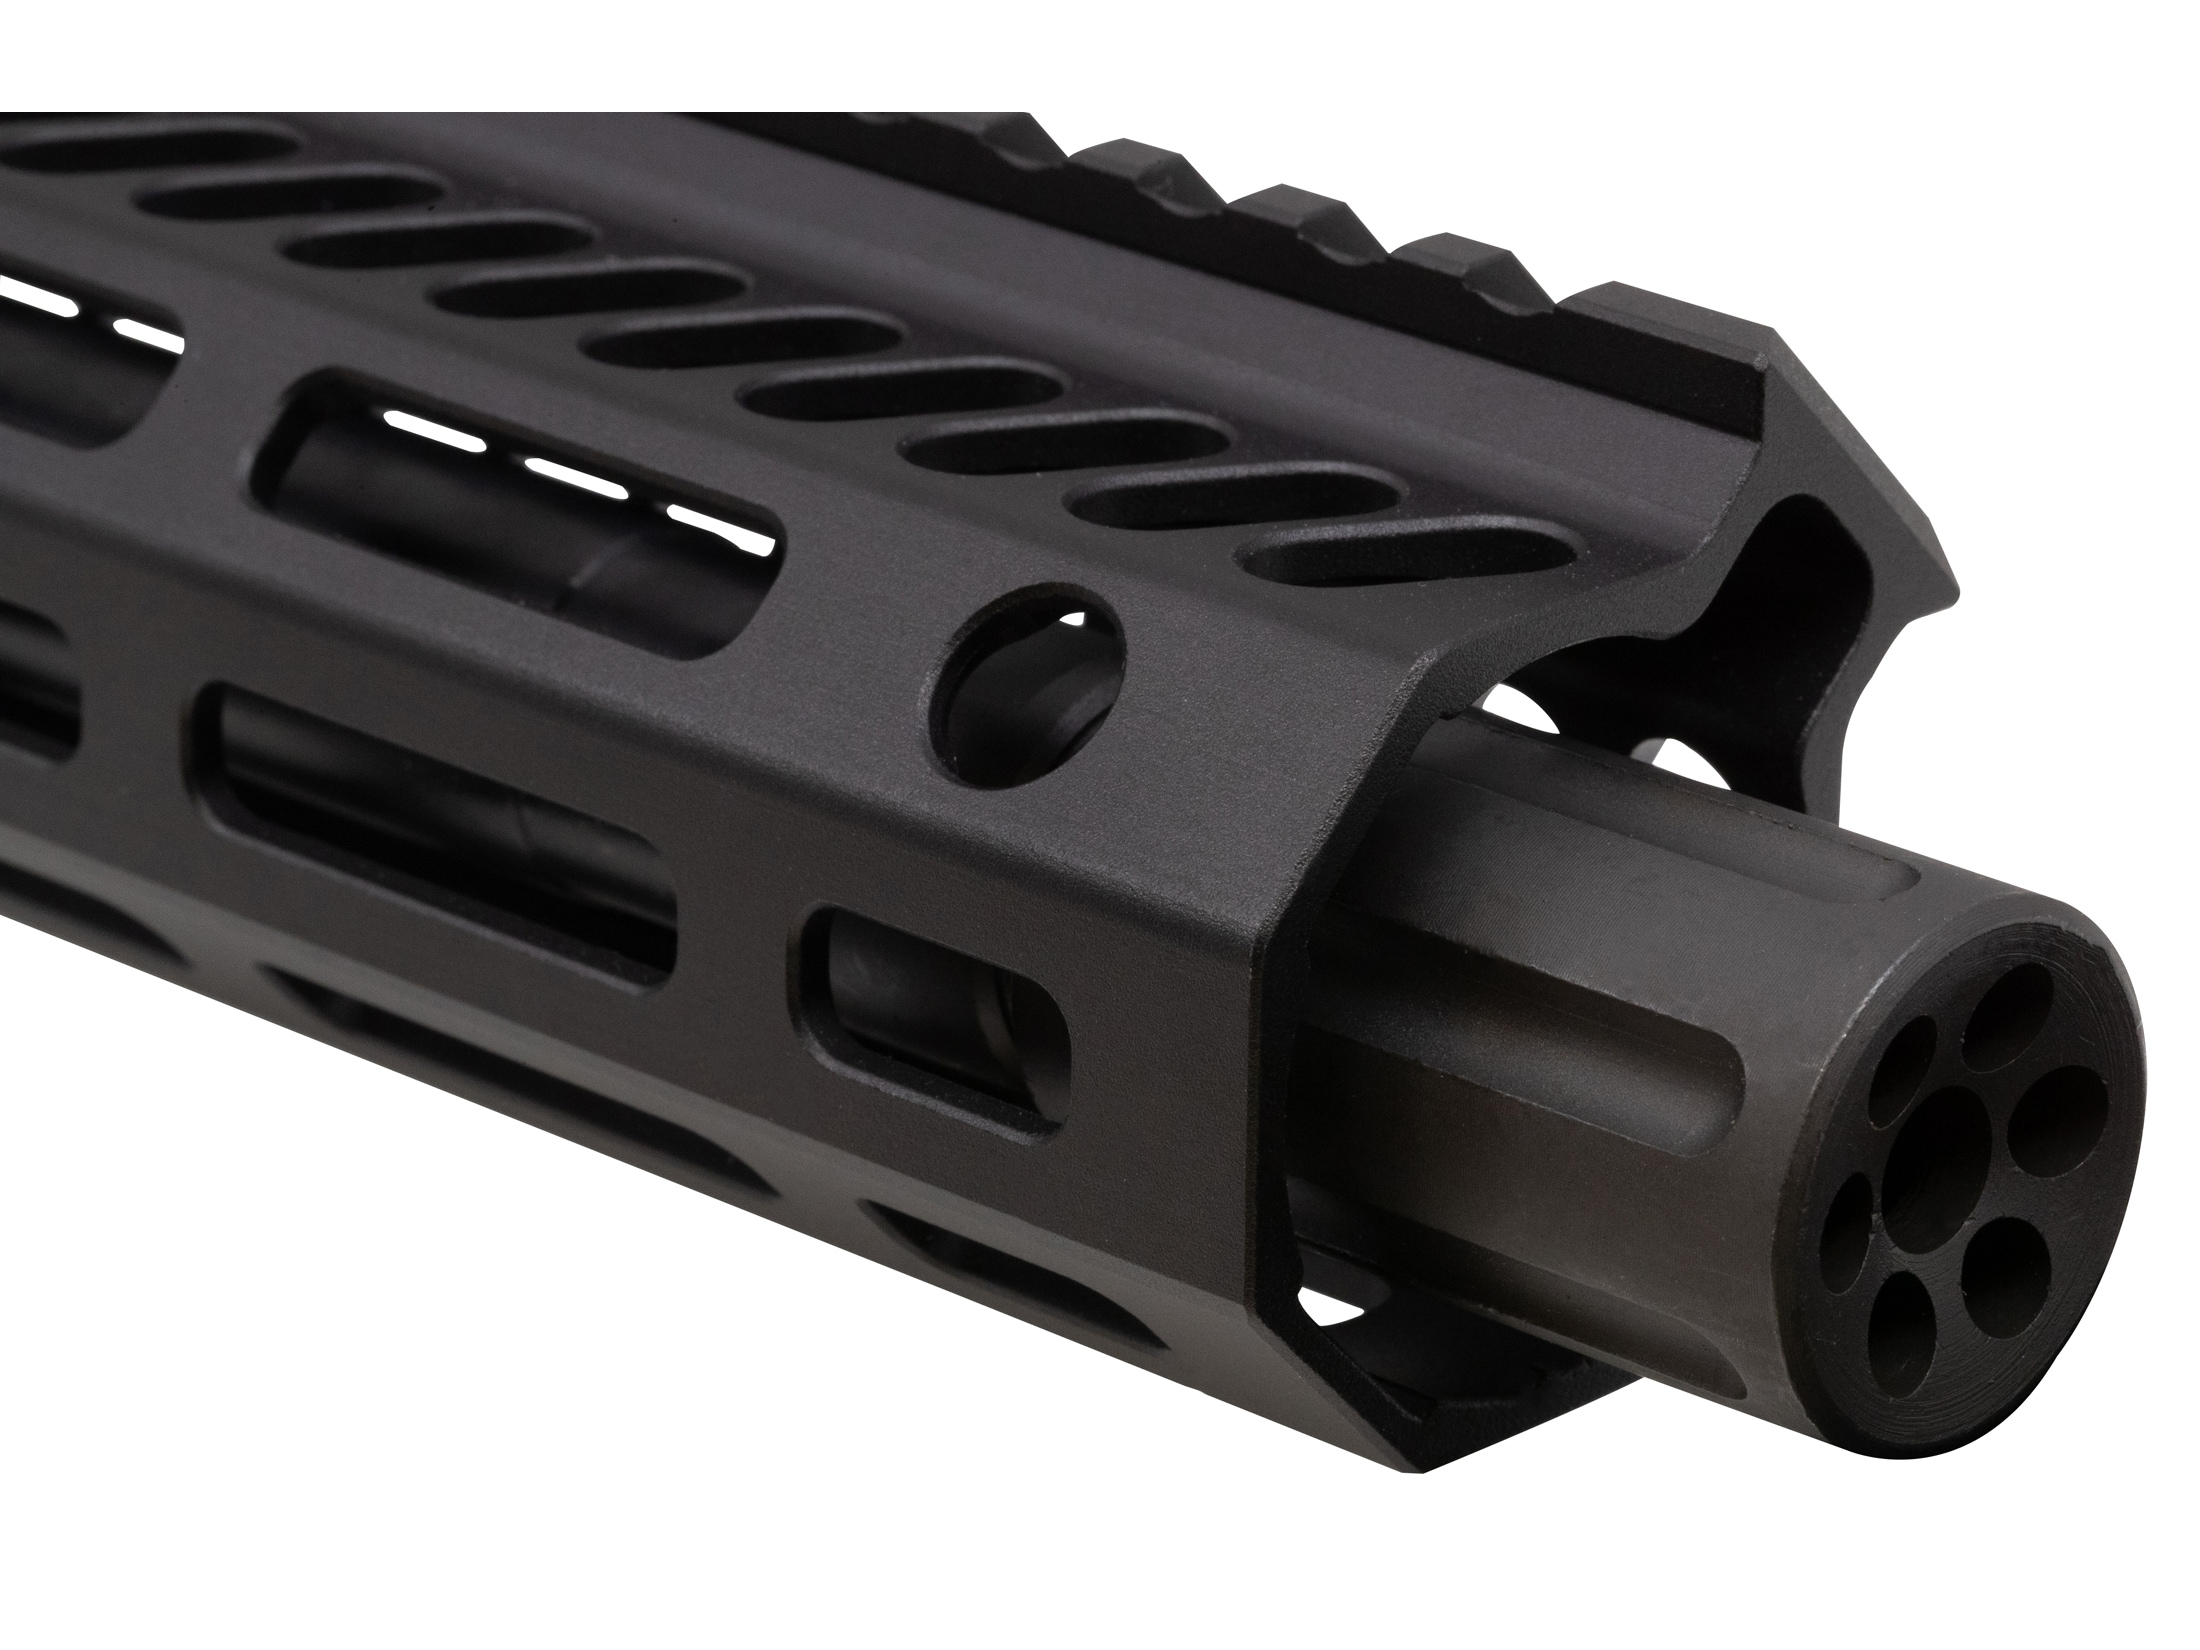 AR-STONER Linear Muzzle Brake 1/2